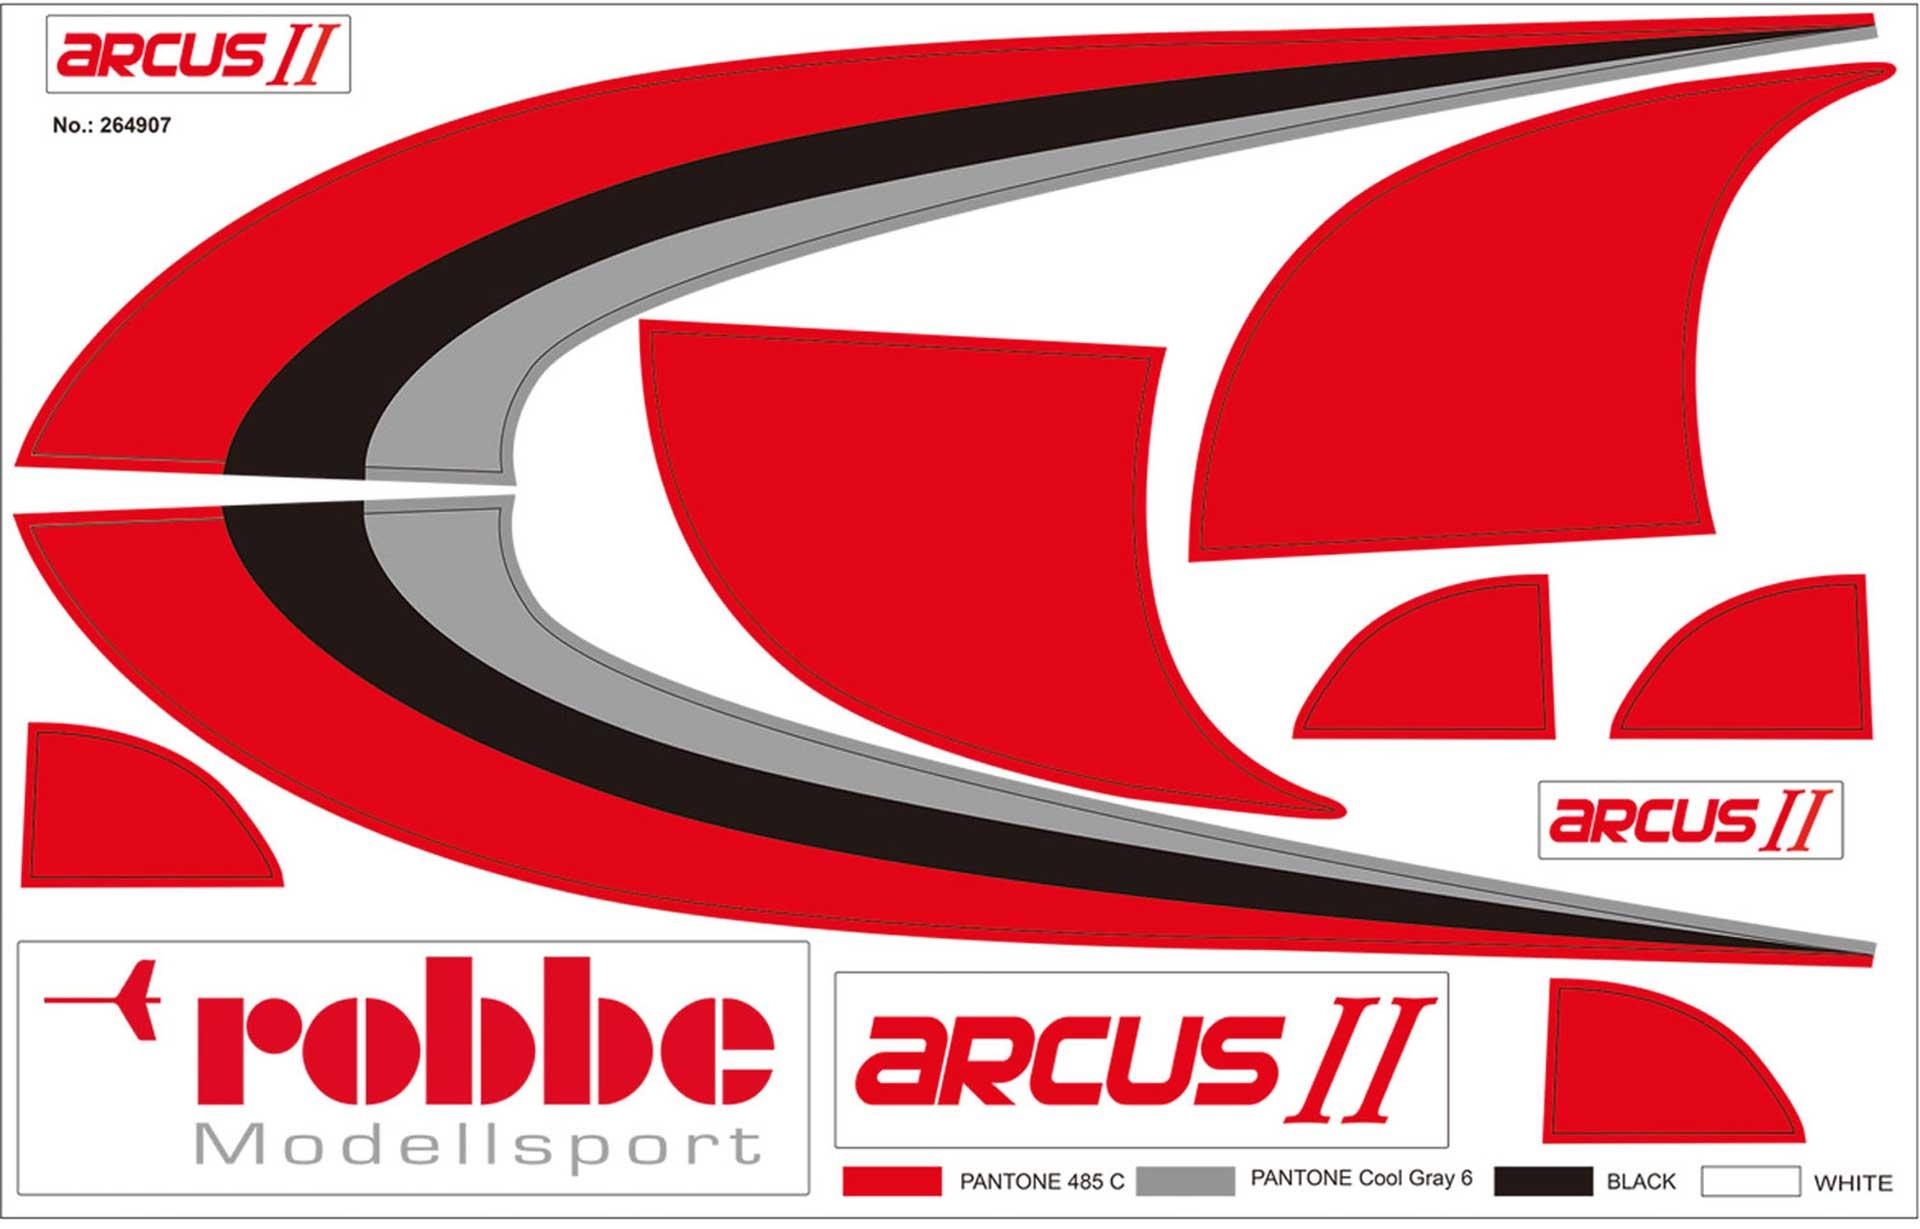 Robbe Modellsport ARCUS II PNP